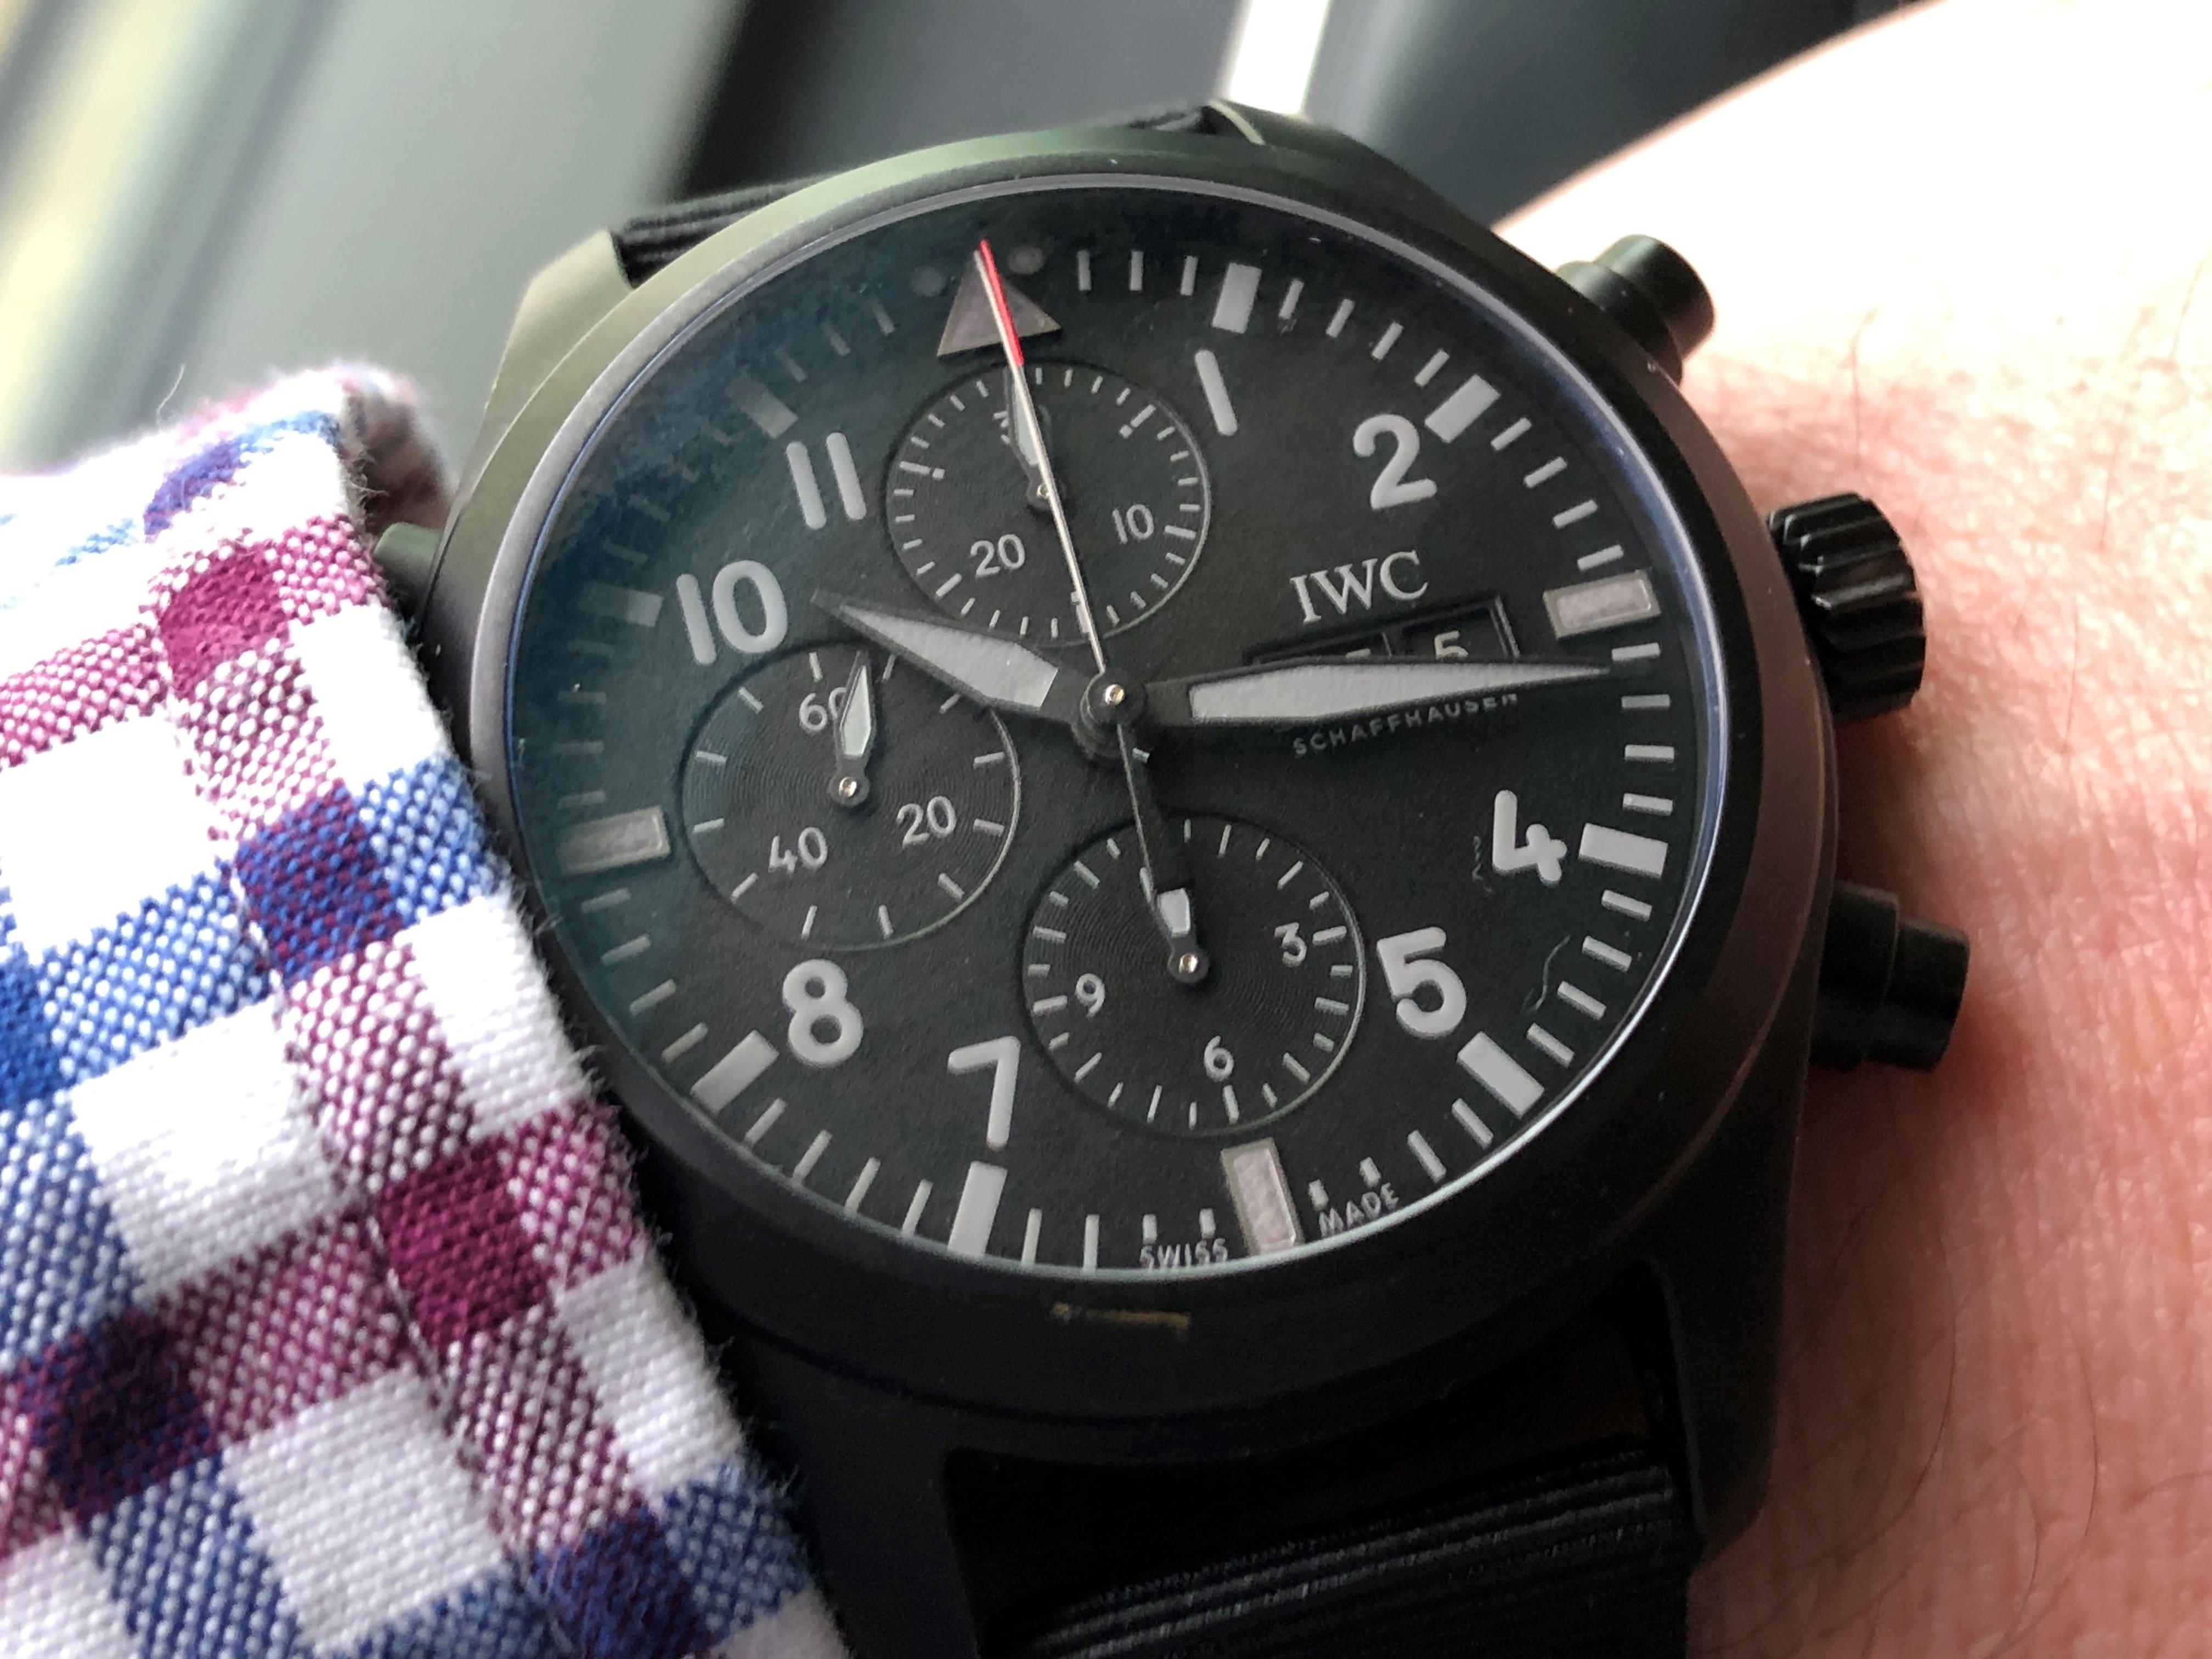 IWC Pilot's Watch Double Chronograph Top Gun Ceratanium am Arm